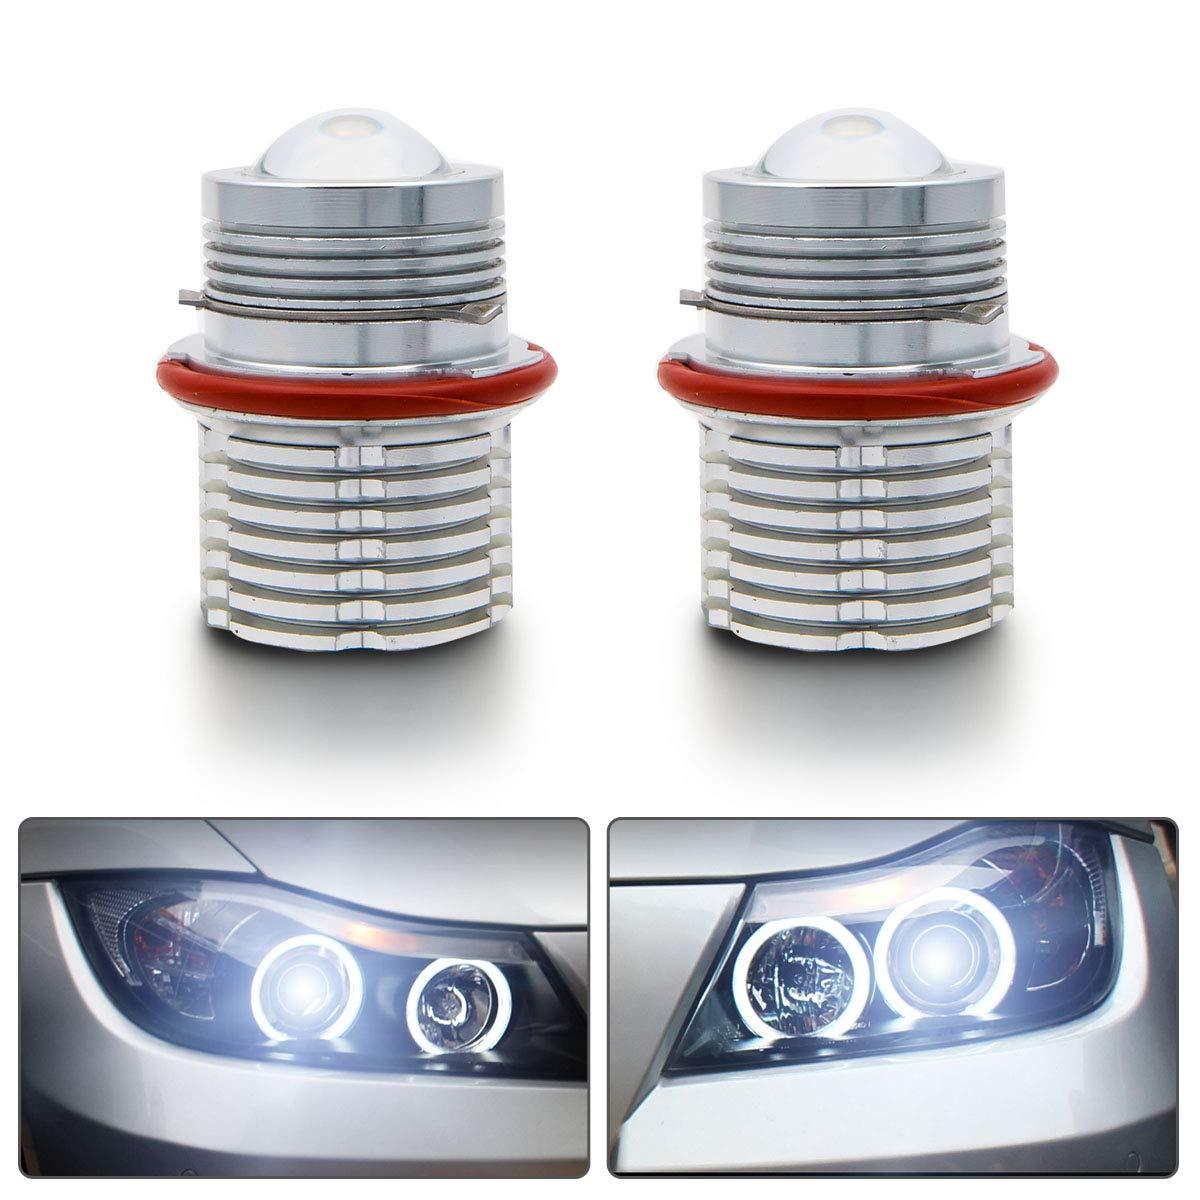 Angel Eyes Halo Ring Bulbs,Maso 90w CREE Led Day Time Lighting for E39 E60 E61 E87 E53 E63 E65 E83 OEM 63126904048 Xenon White